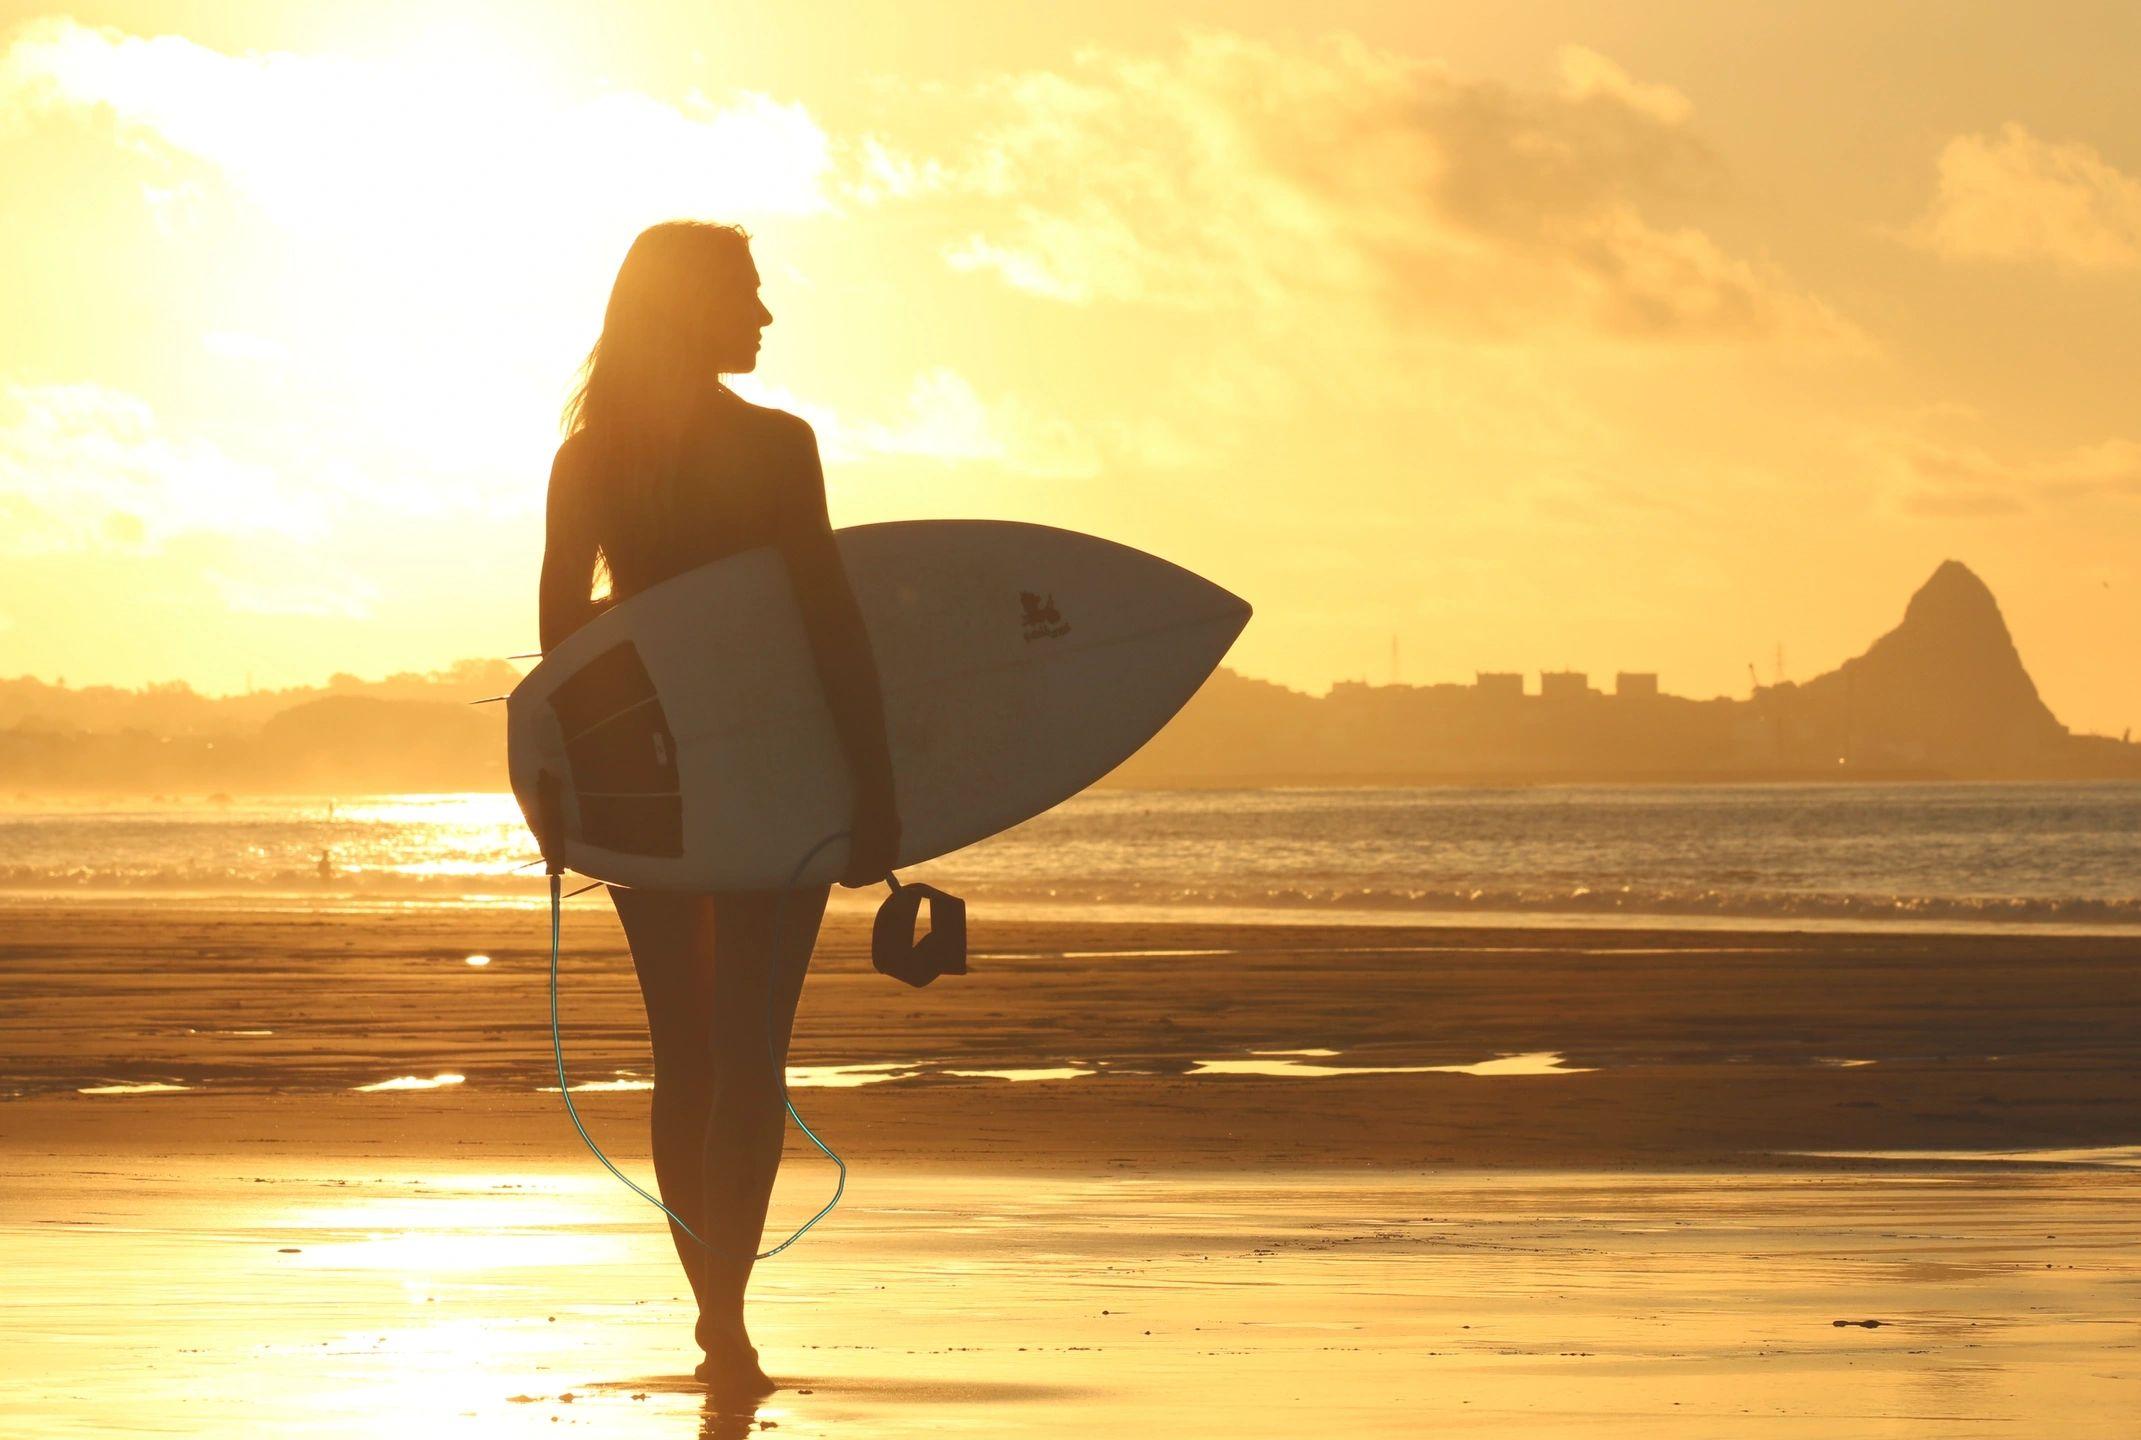 7 Things to Do in Oceanside, California